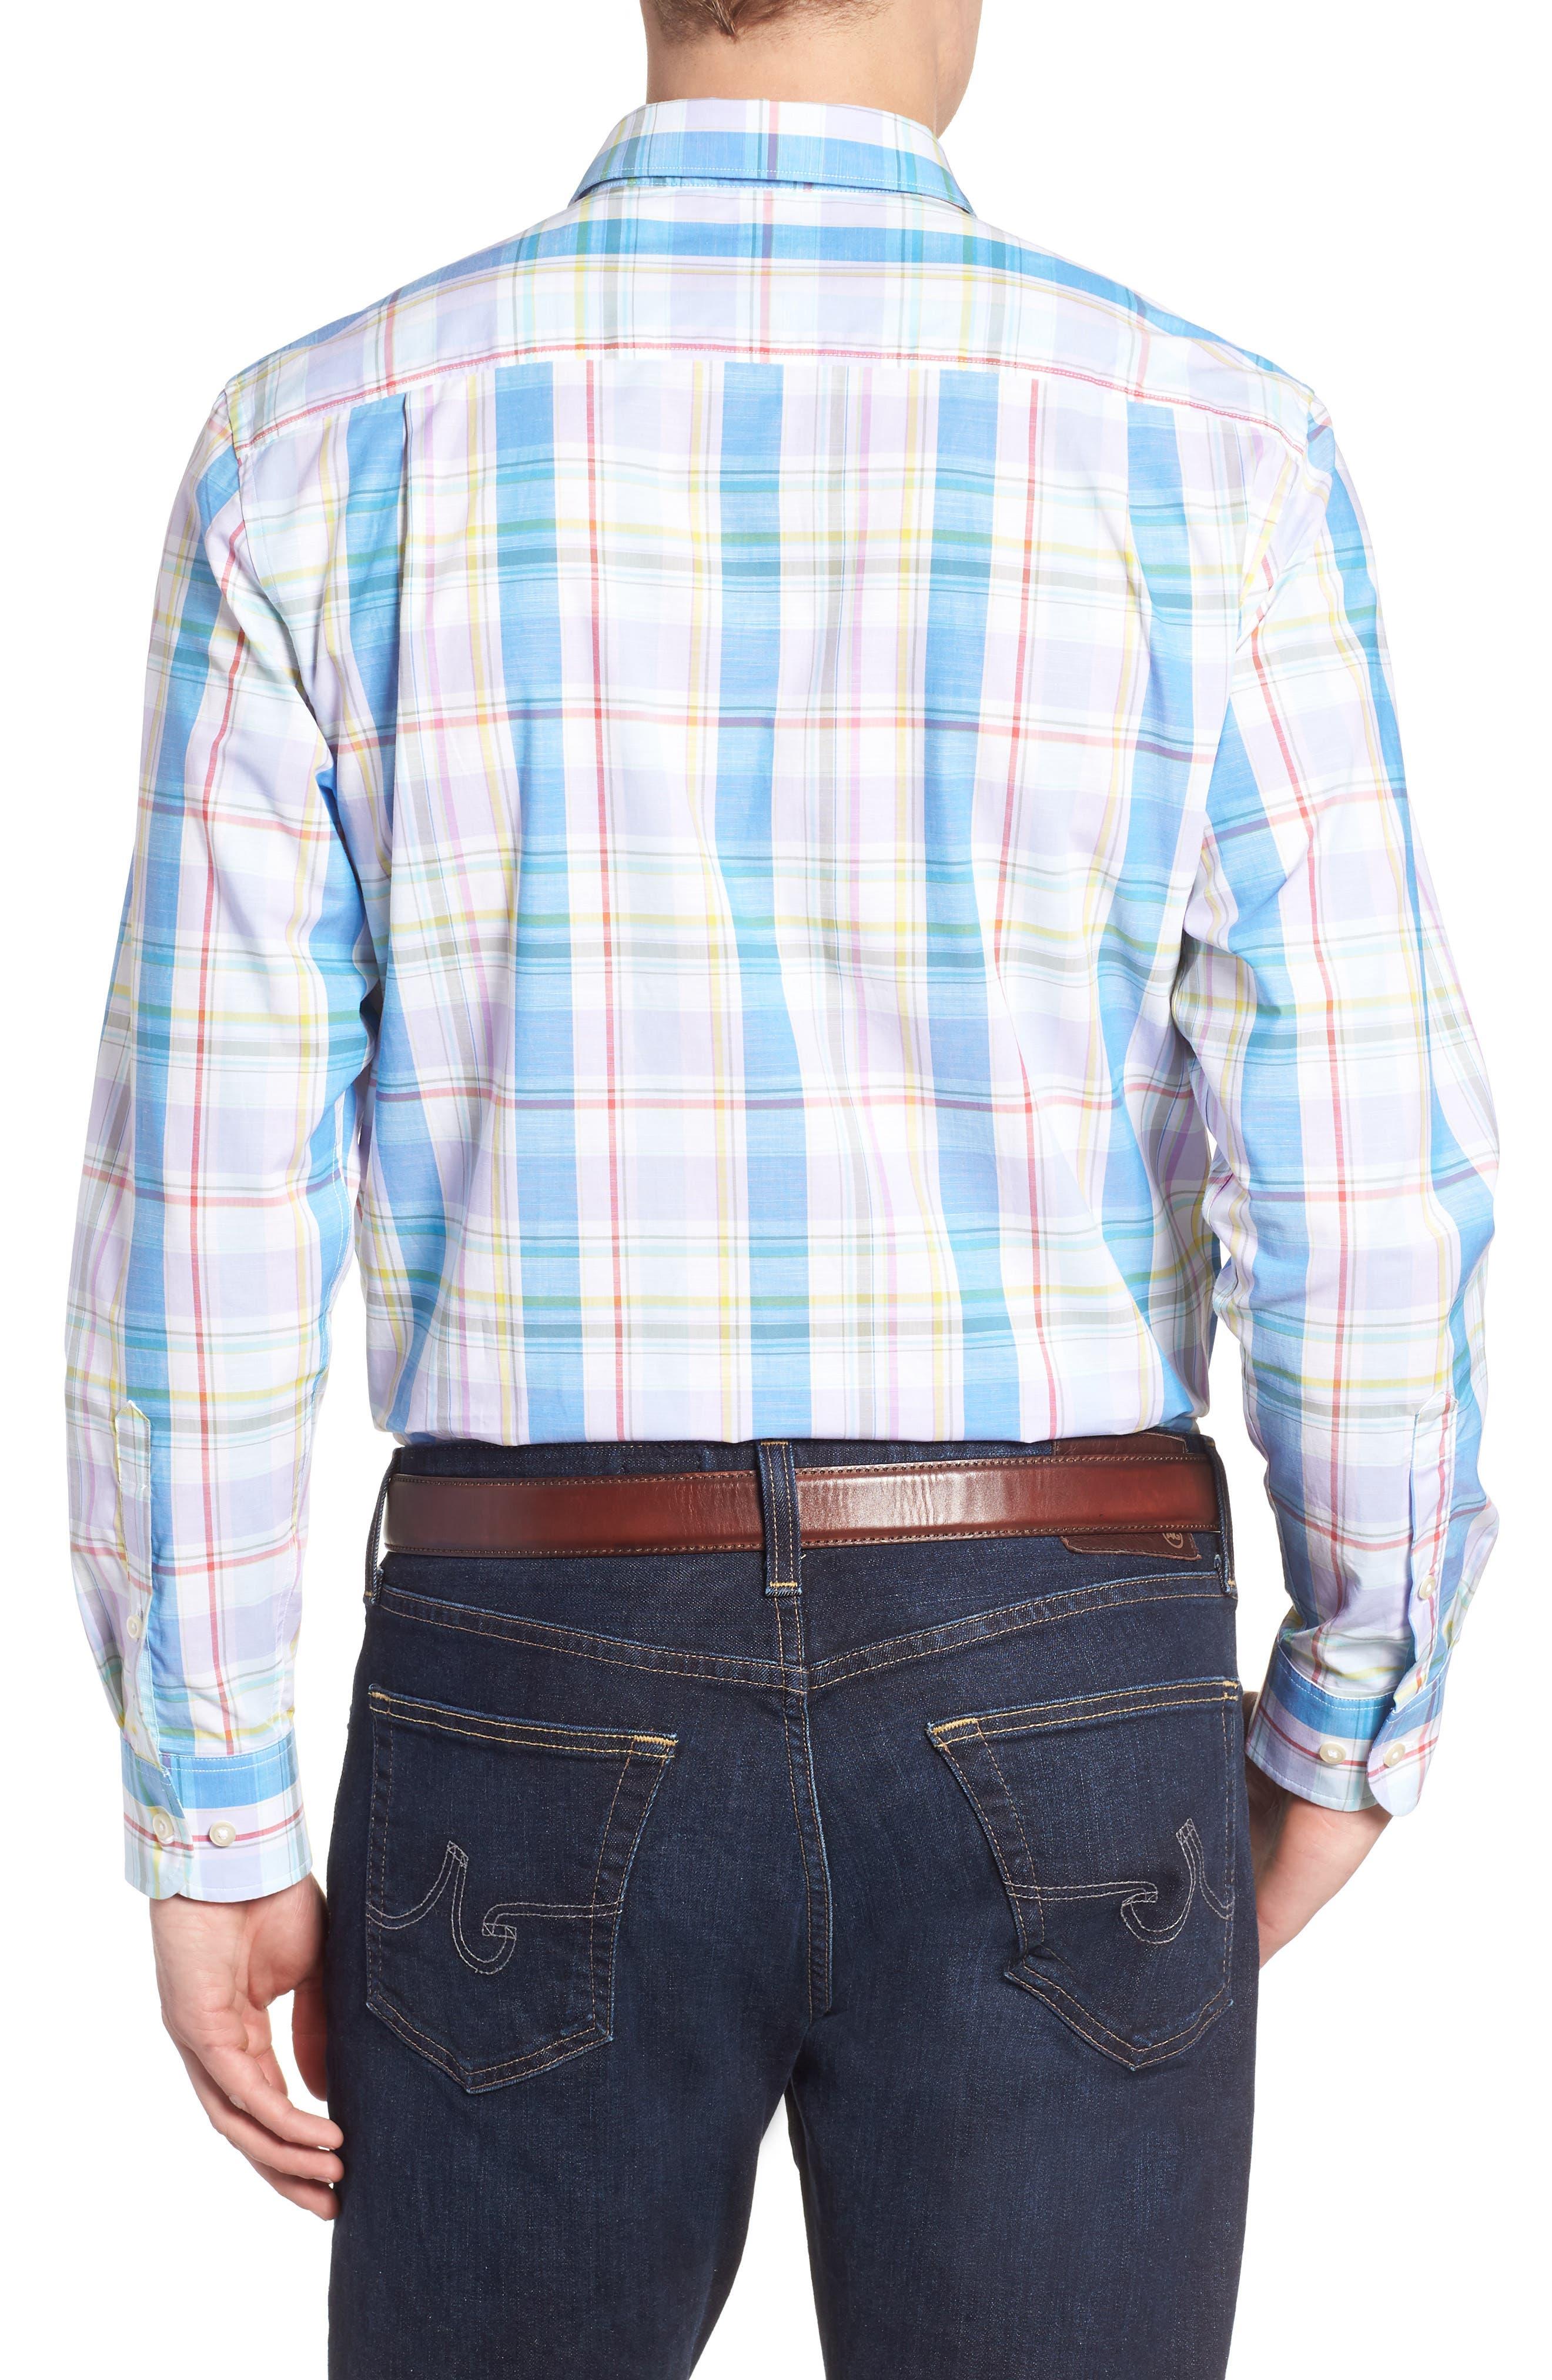 Privada Plaid Sport Shirt,                             Alternate thumbnail 3, color,                             Blue Aster